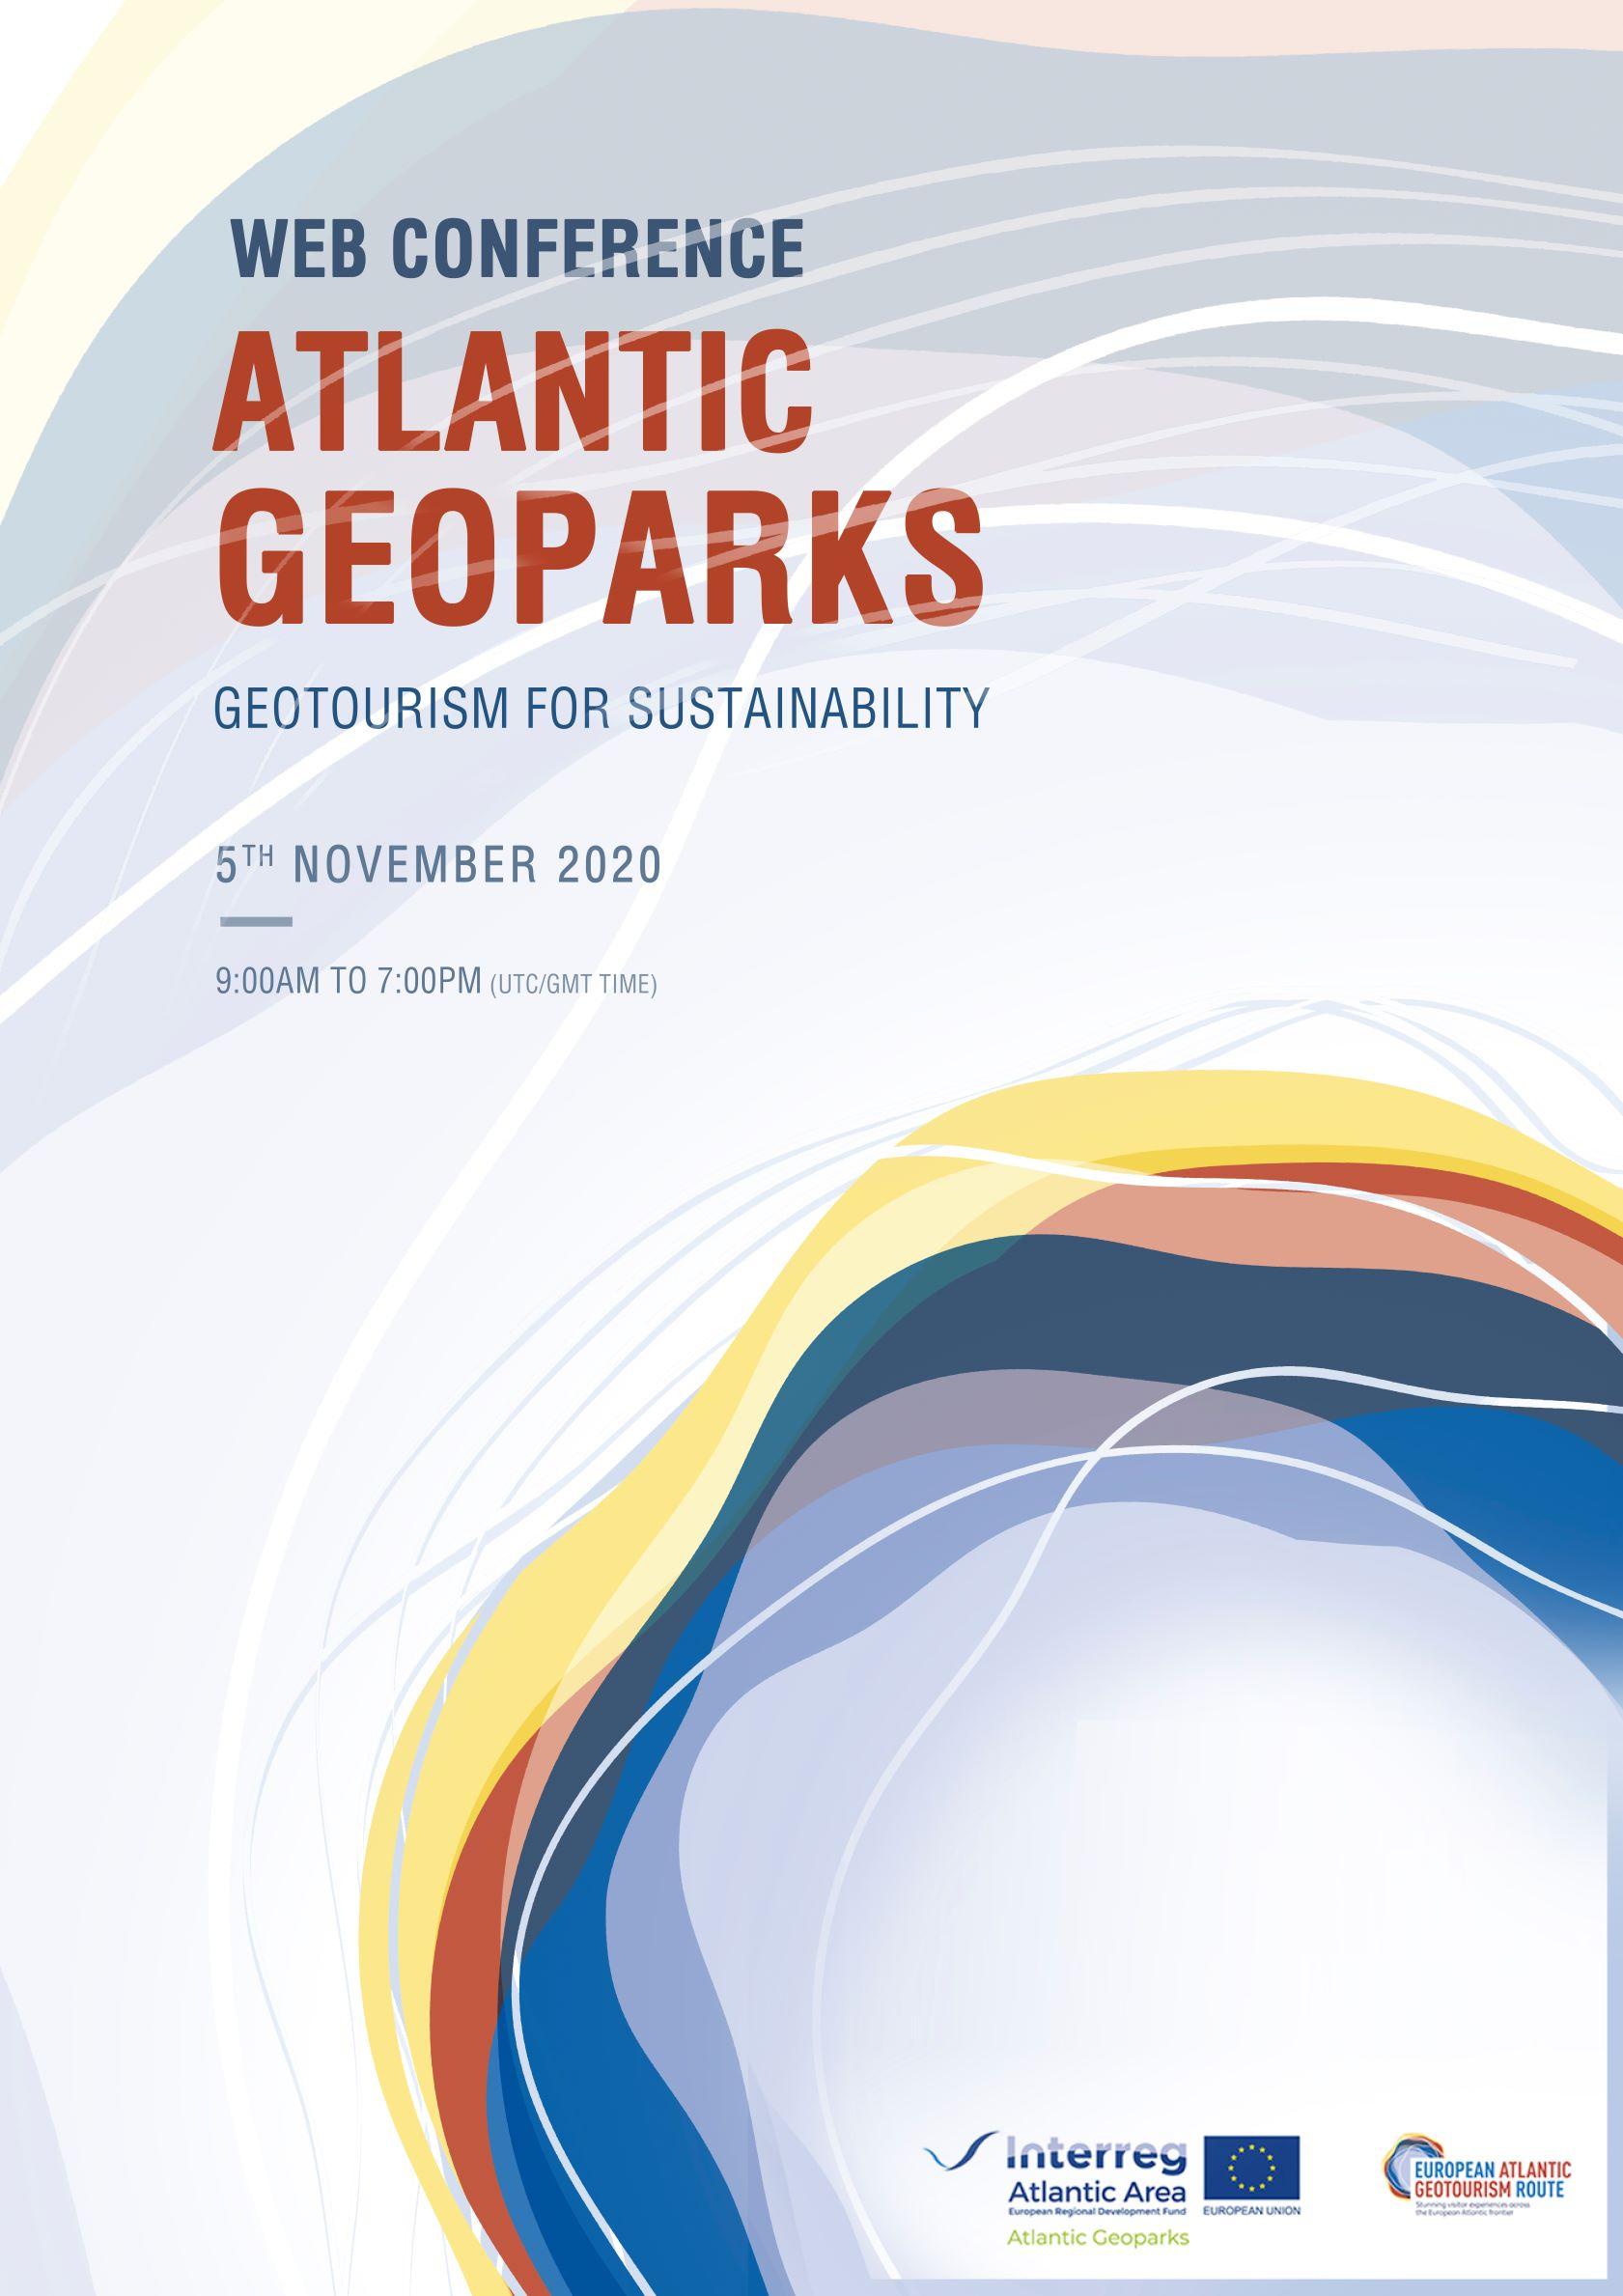 Conferência Web 'Geoparks Atlânticos – Geoturismo para a Sustentabilidade'